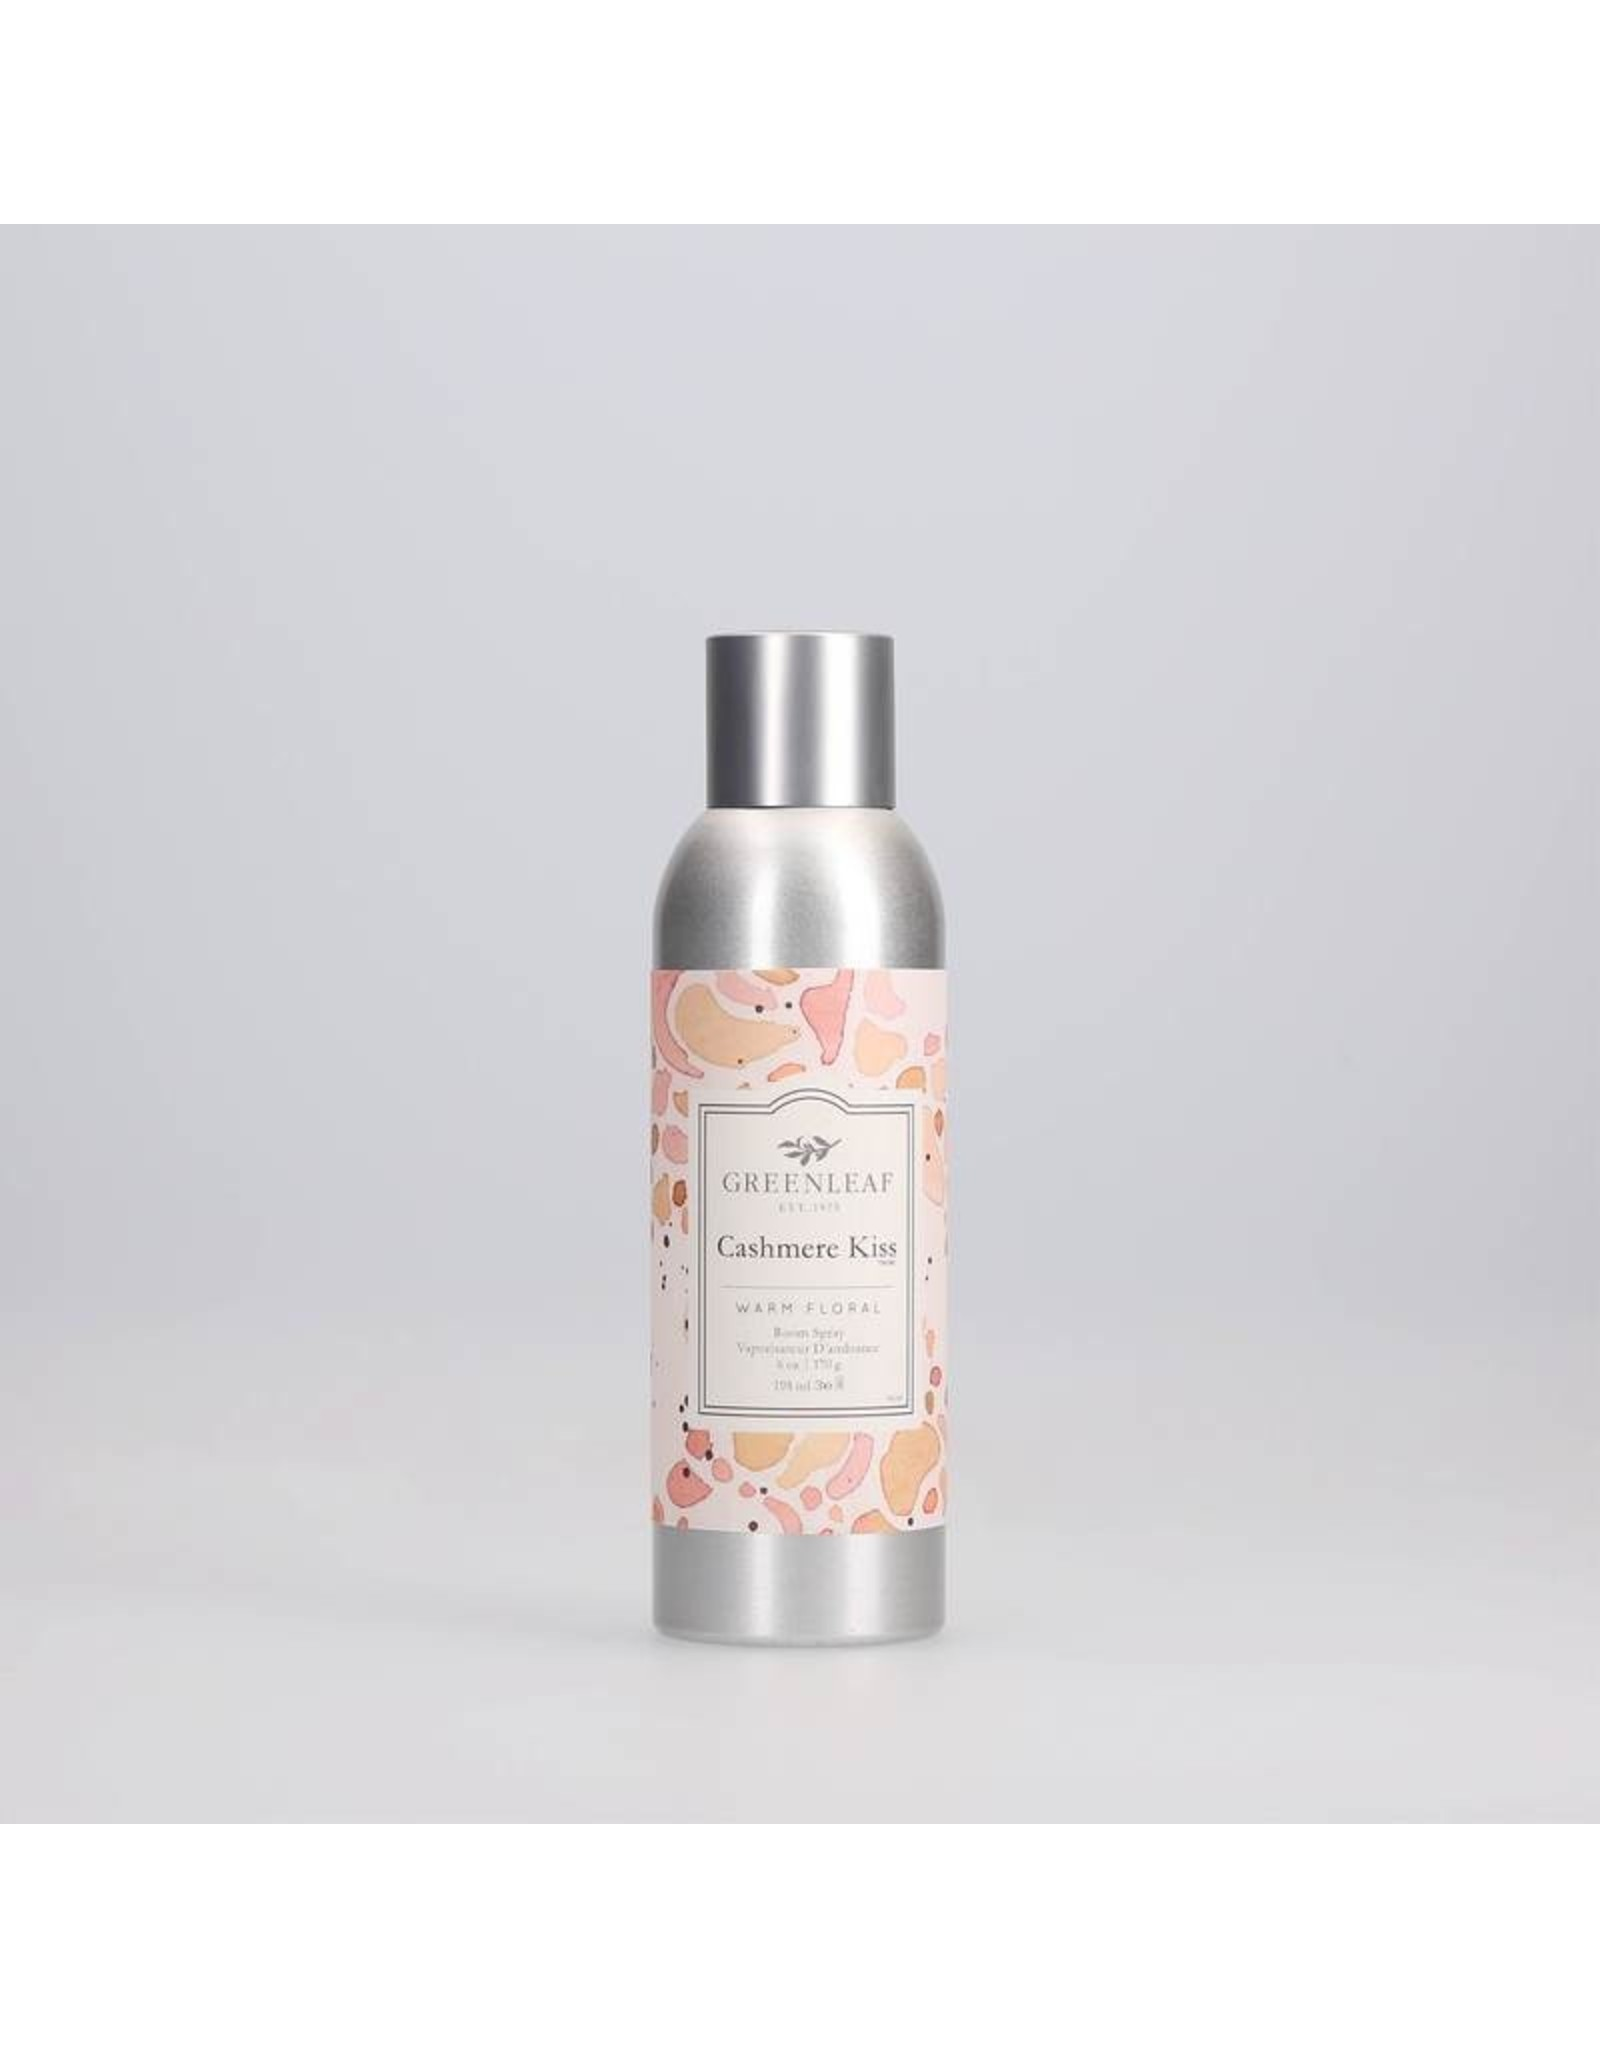 Greenleaf Cashmere Kiss Room Spray